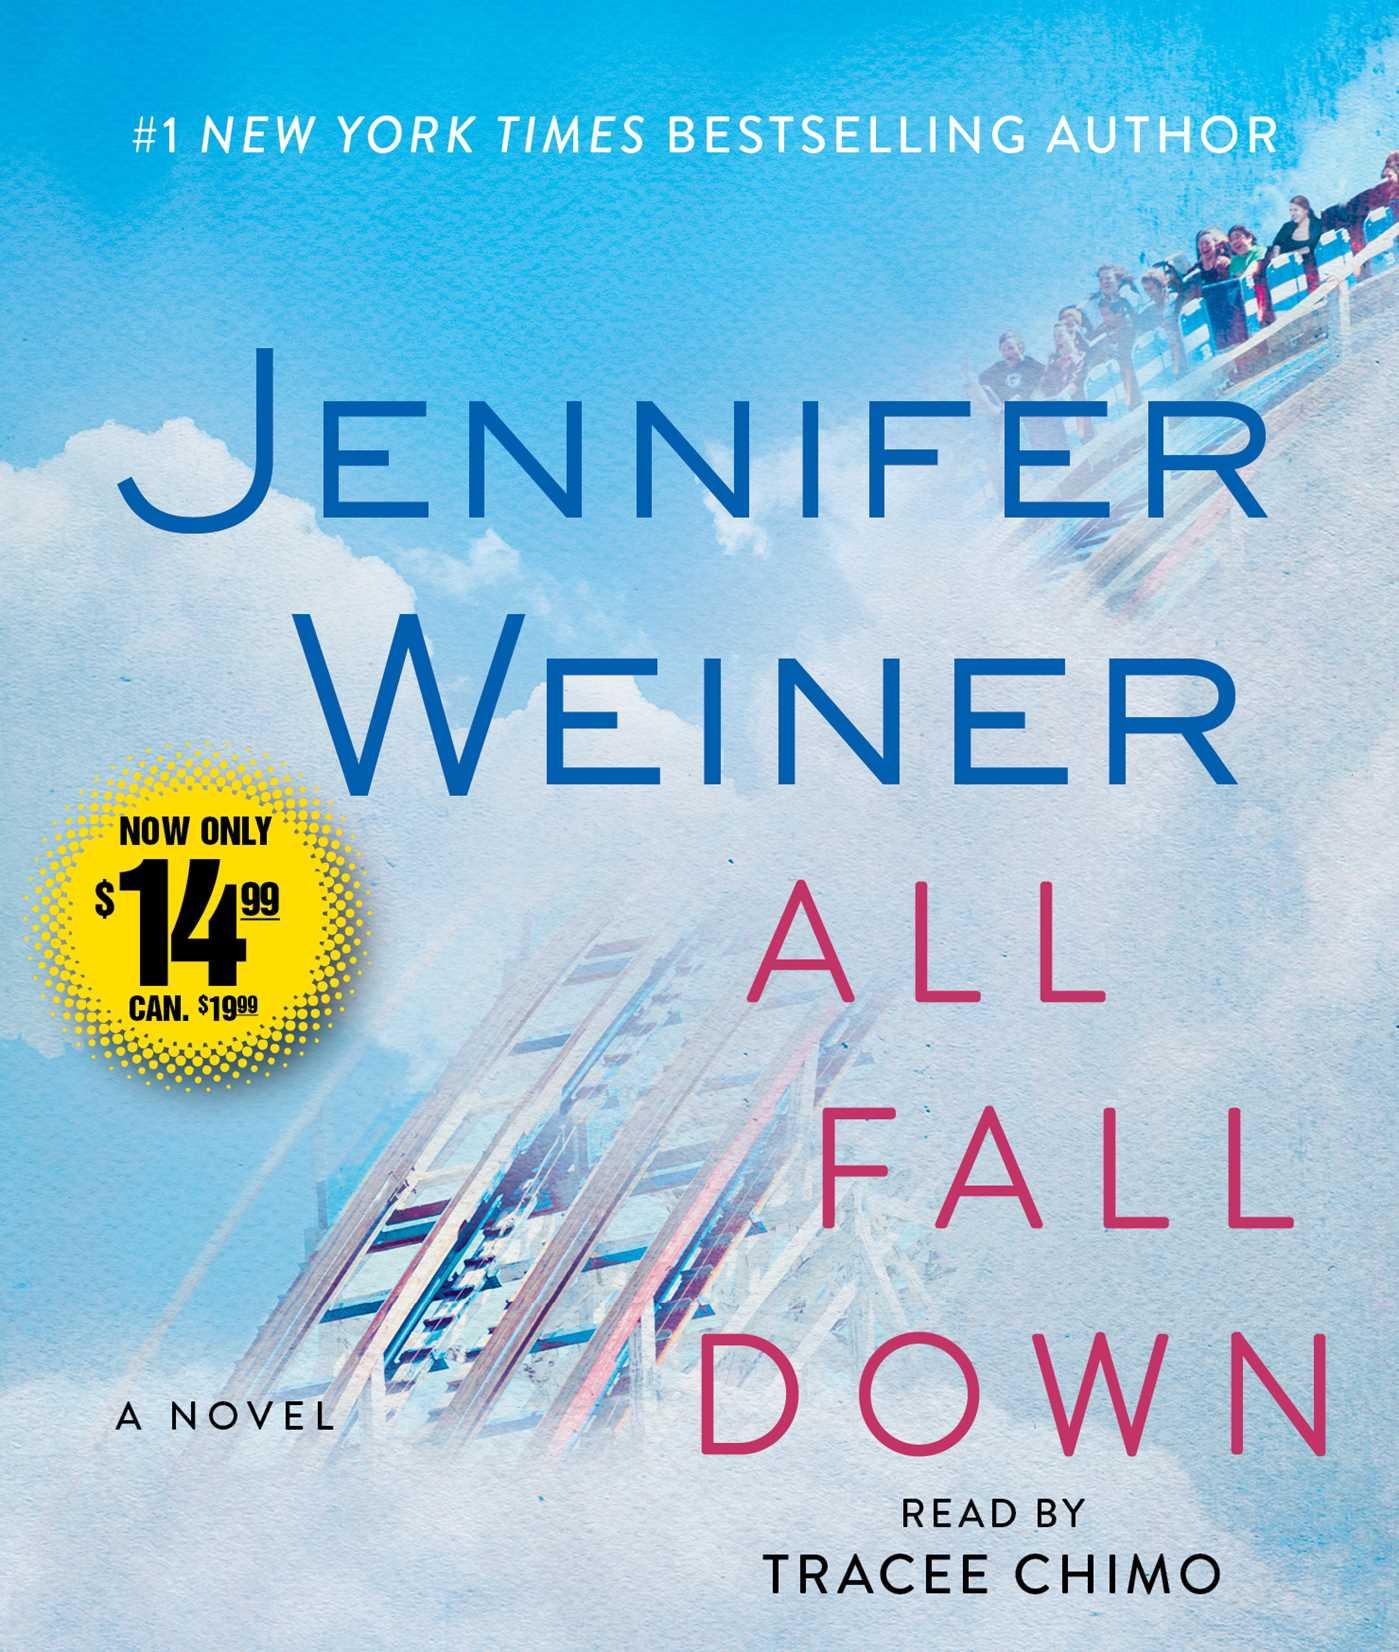 All fall down 9781442387874 hr